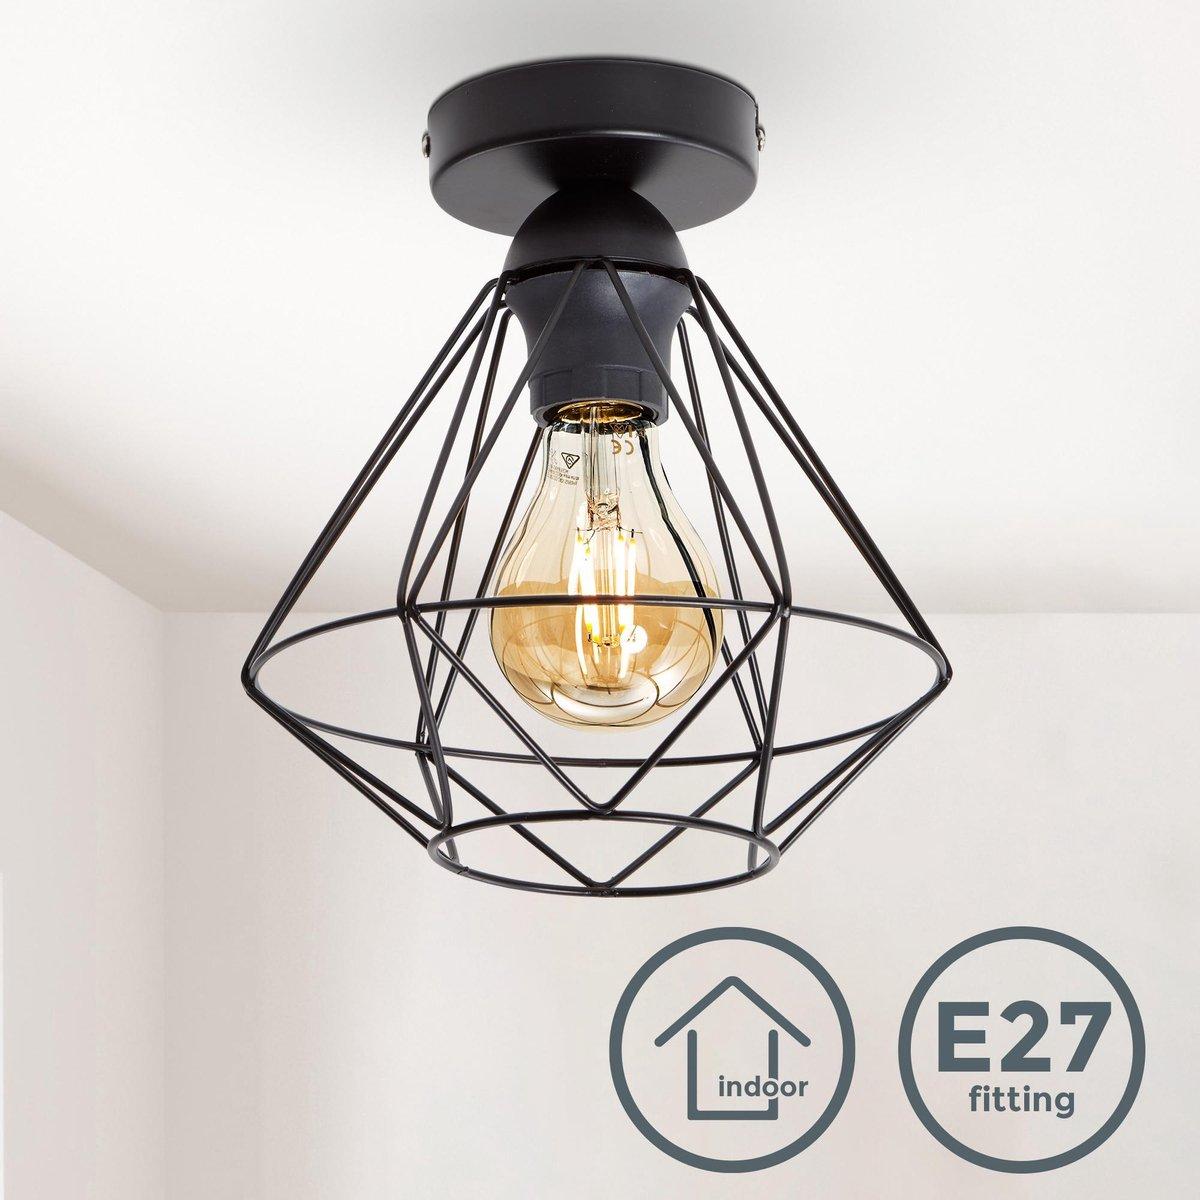 B.K.Licht - Plafondlamp - zwart - industrieel - retro - draad - vintage - woonkamer -  22cm - excl.